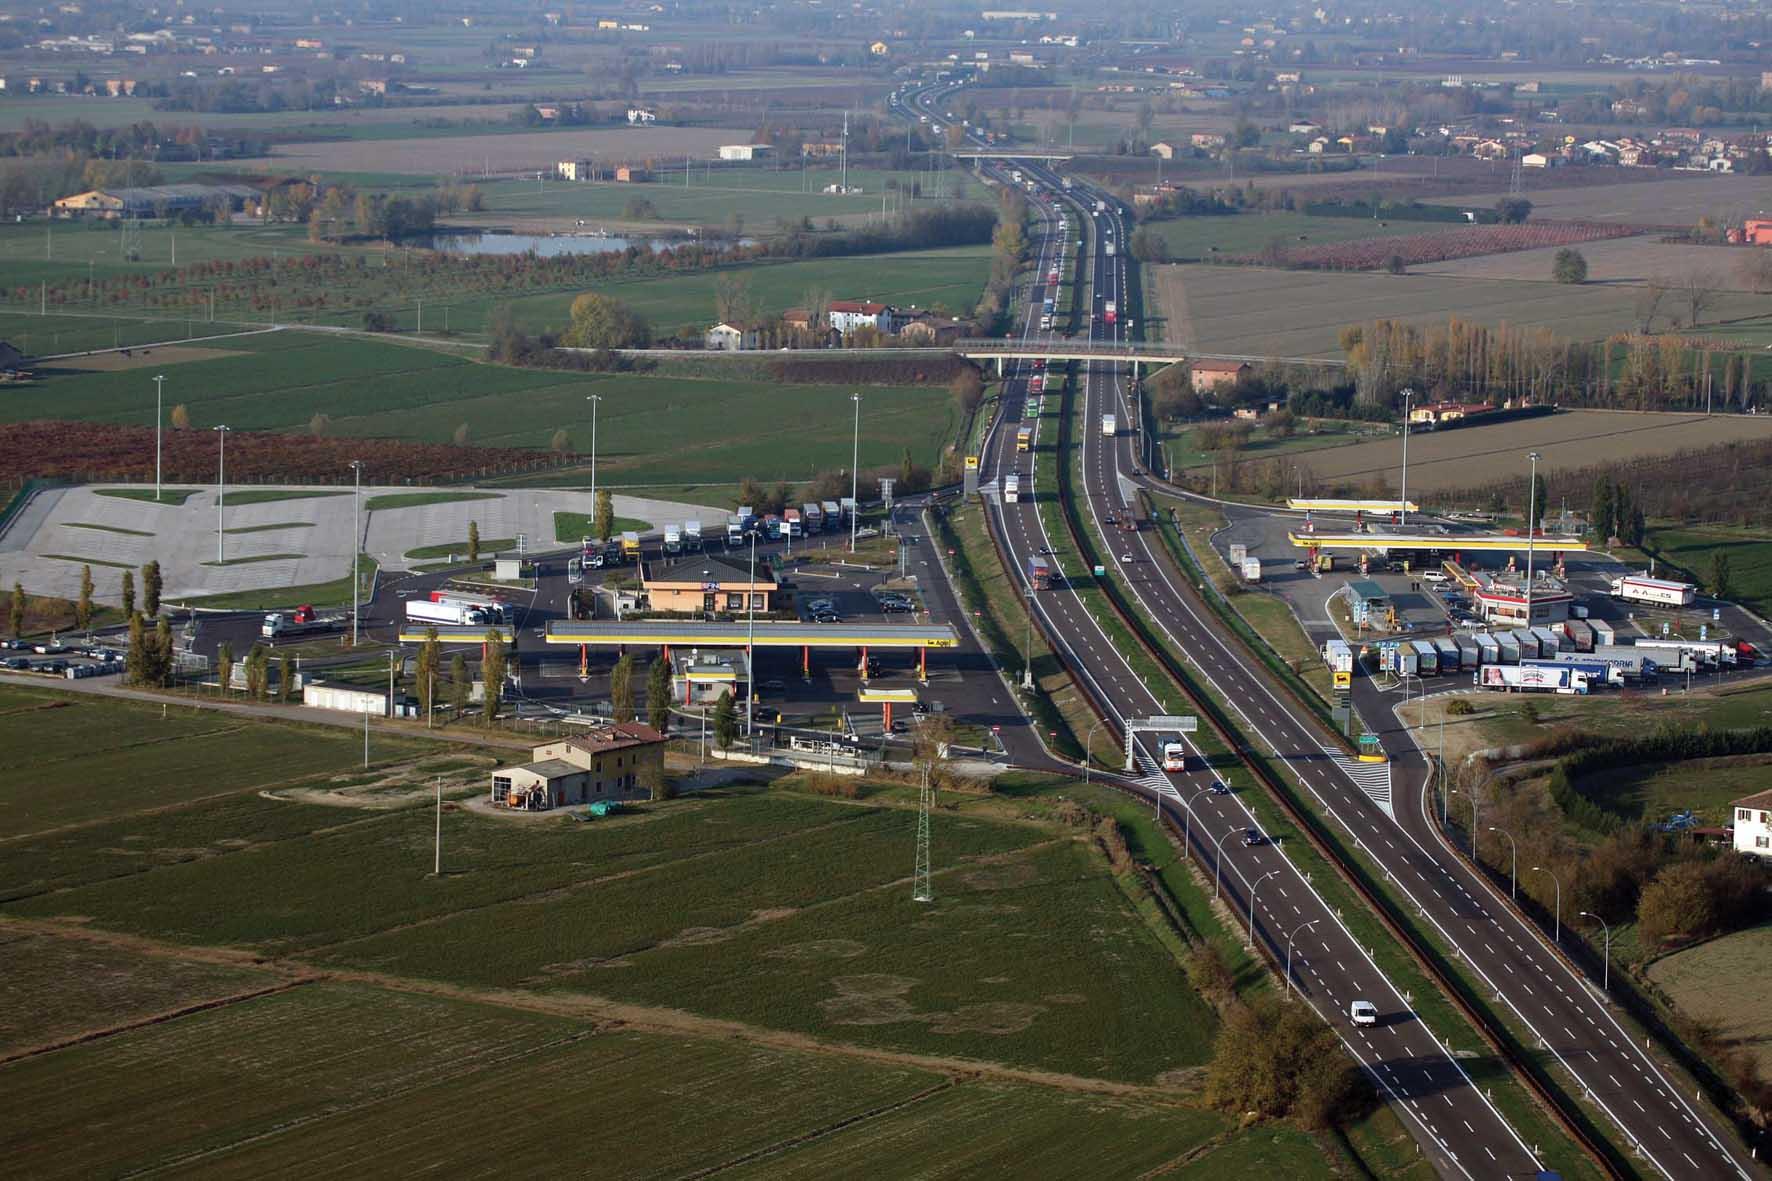 A22 infrastruttura vista aerea paesaggio camion area sosta campogalliano 1